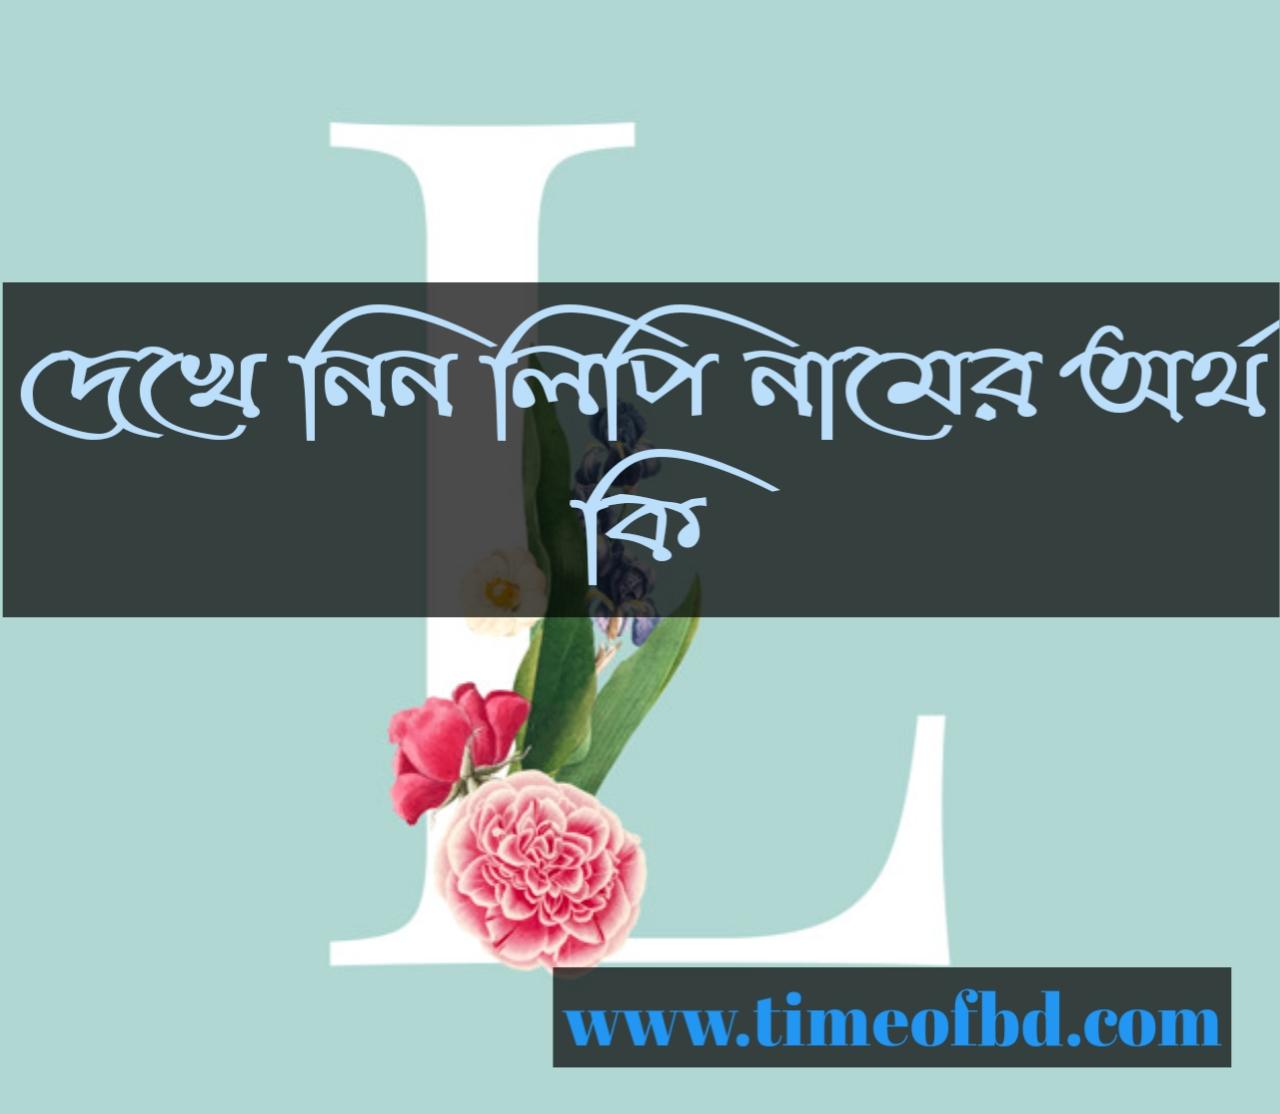 lipi name meaning in Bengali, লিপি নামের অর্থ কি, লিপি নামের বাংলা অর্থ কি, লিপি নামের ইসলামিক অর্থ কি,